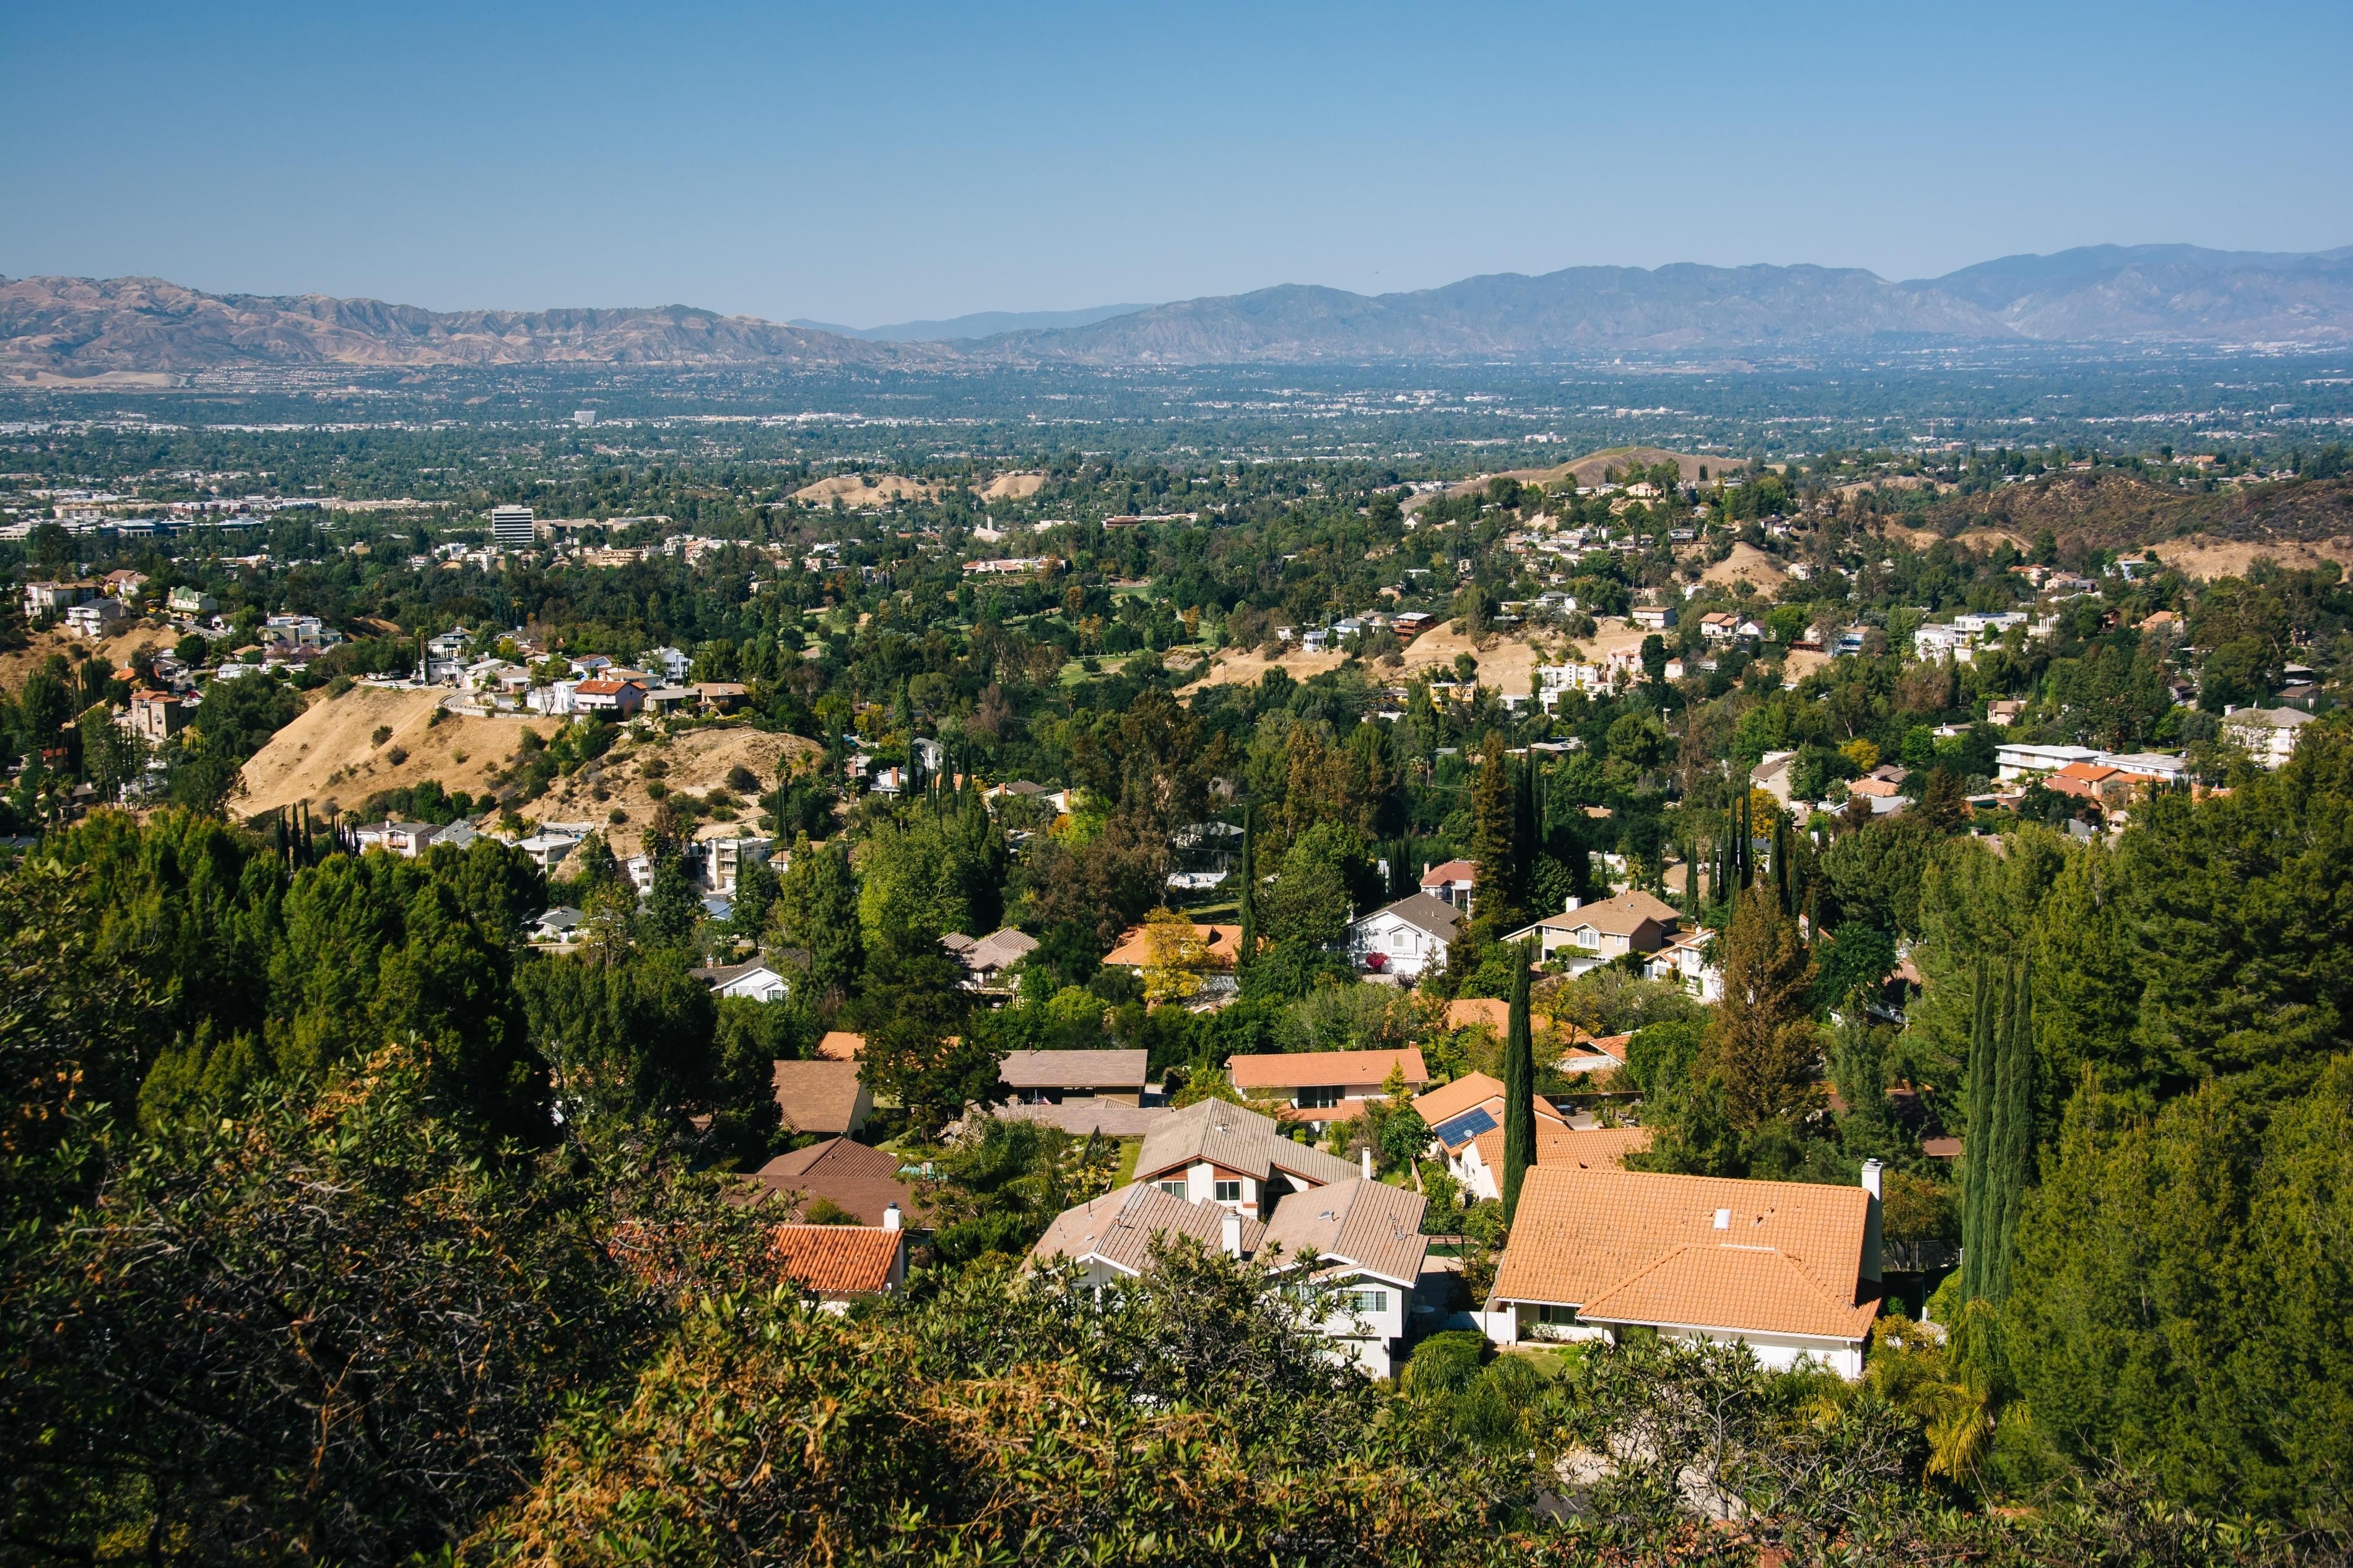 Topanga, California, United States of America